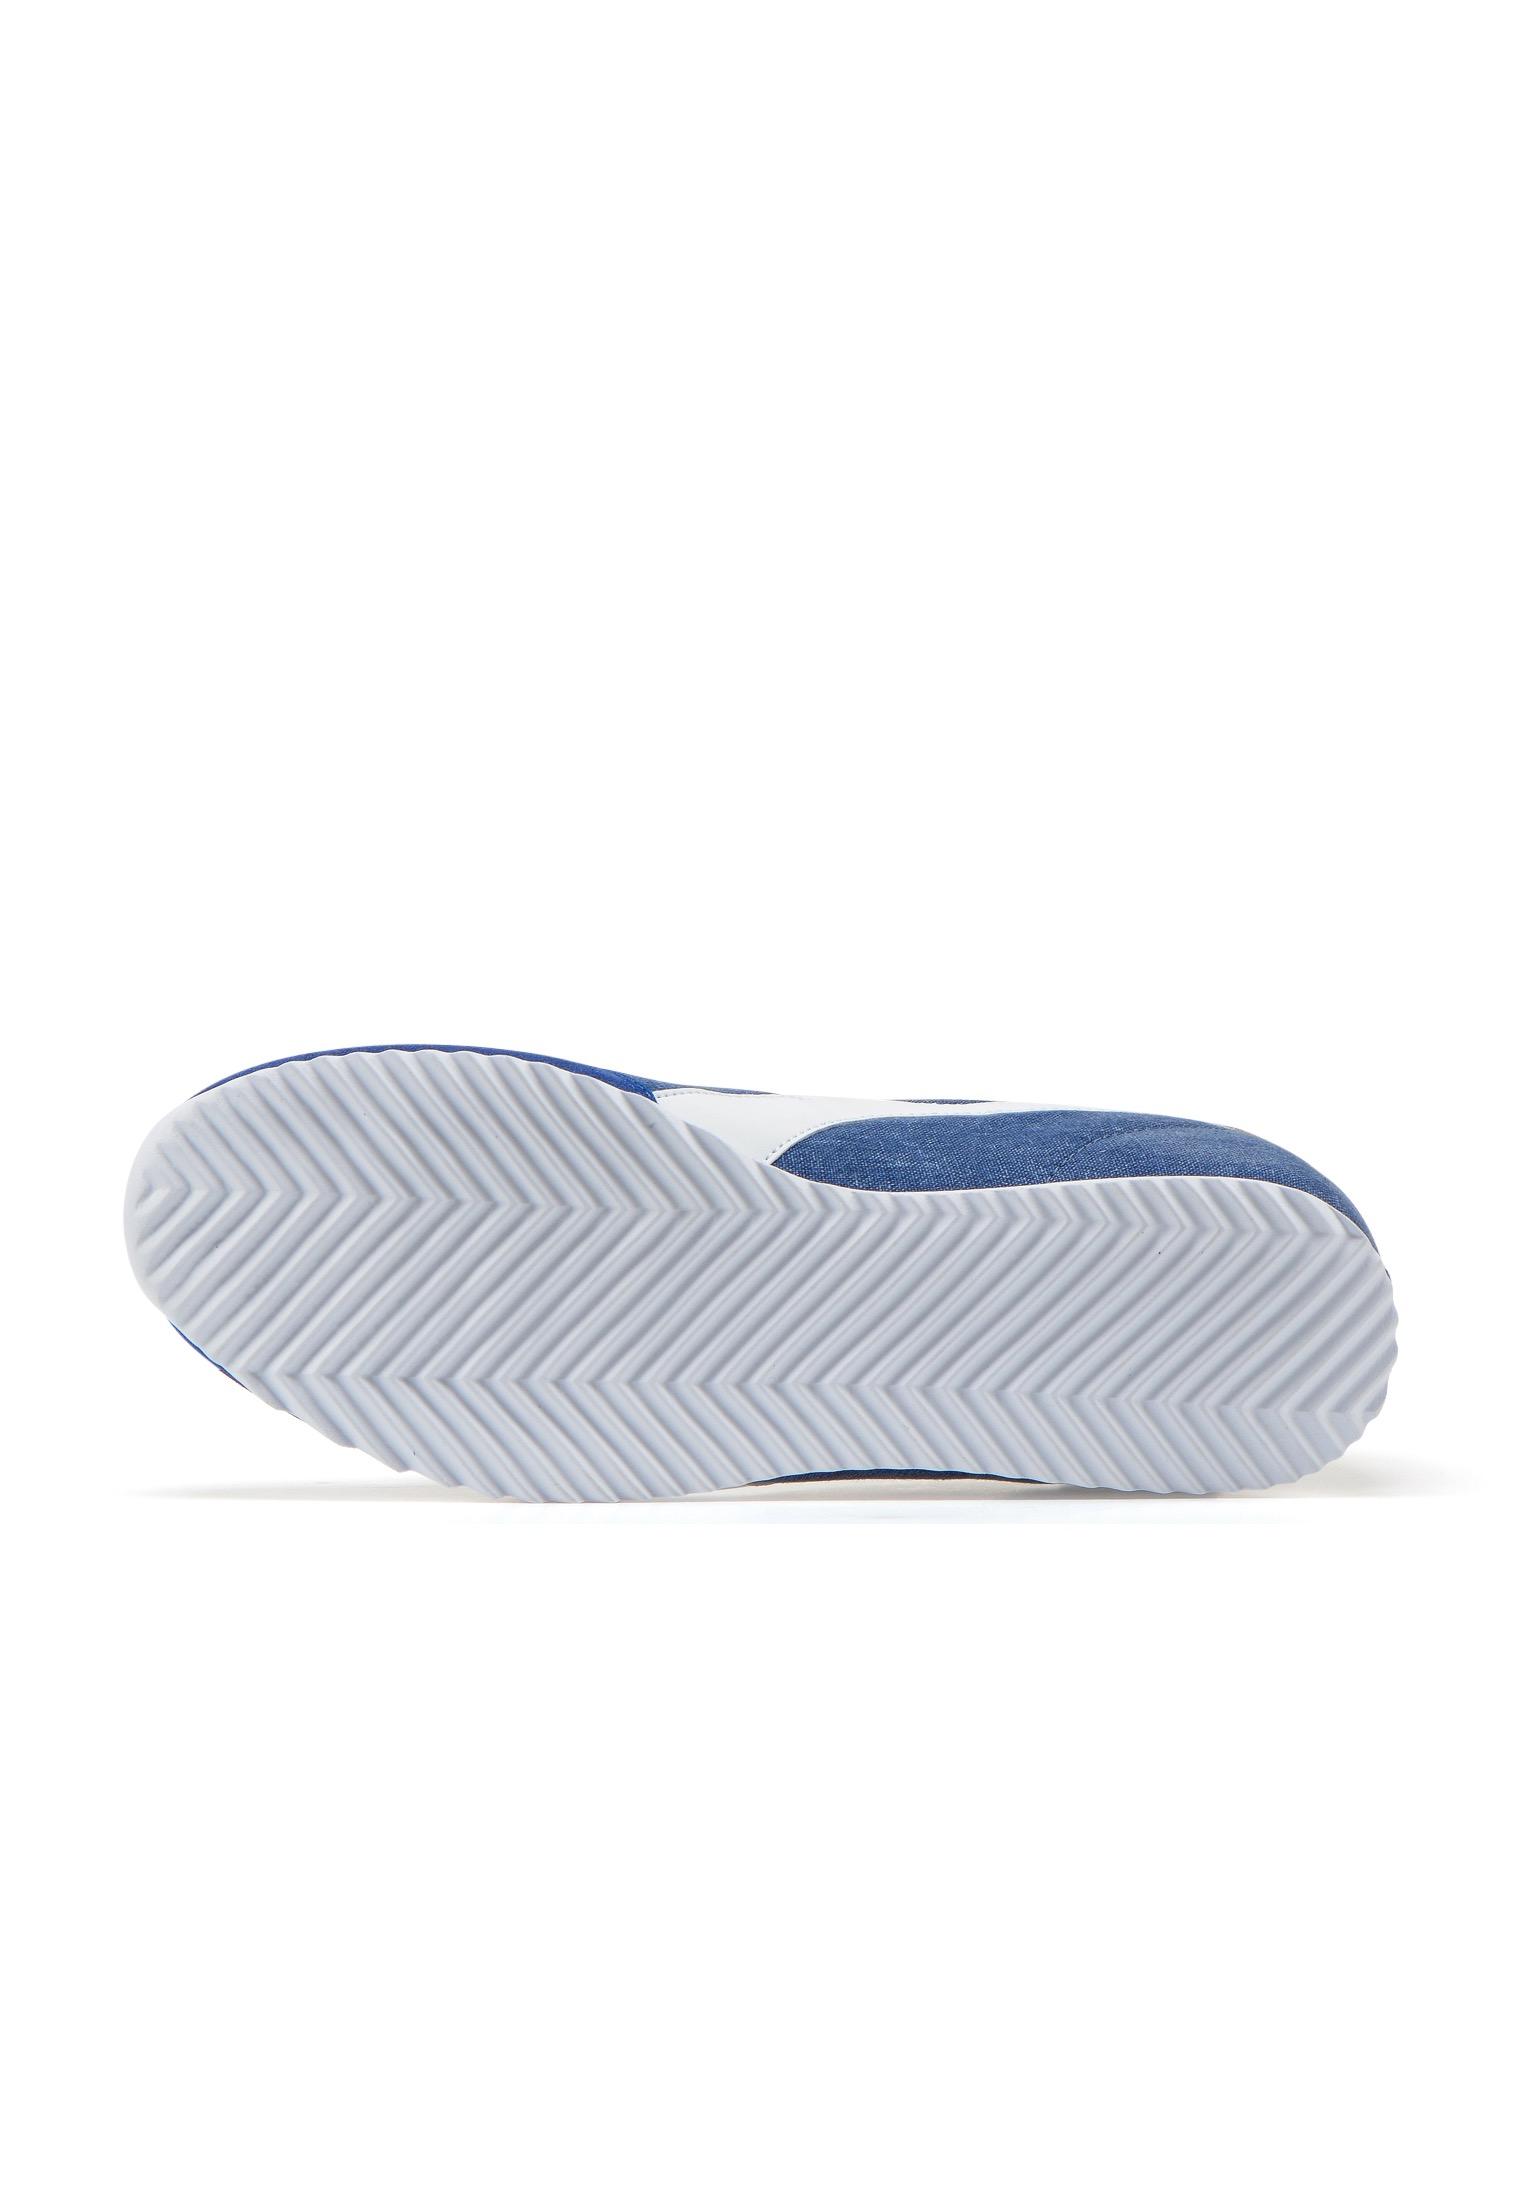 Scarpe-Diadora-Jog-Light-C-Sneakers-sportive-uomo-donna-vari-colori-e-taglie miniatura 16